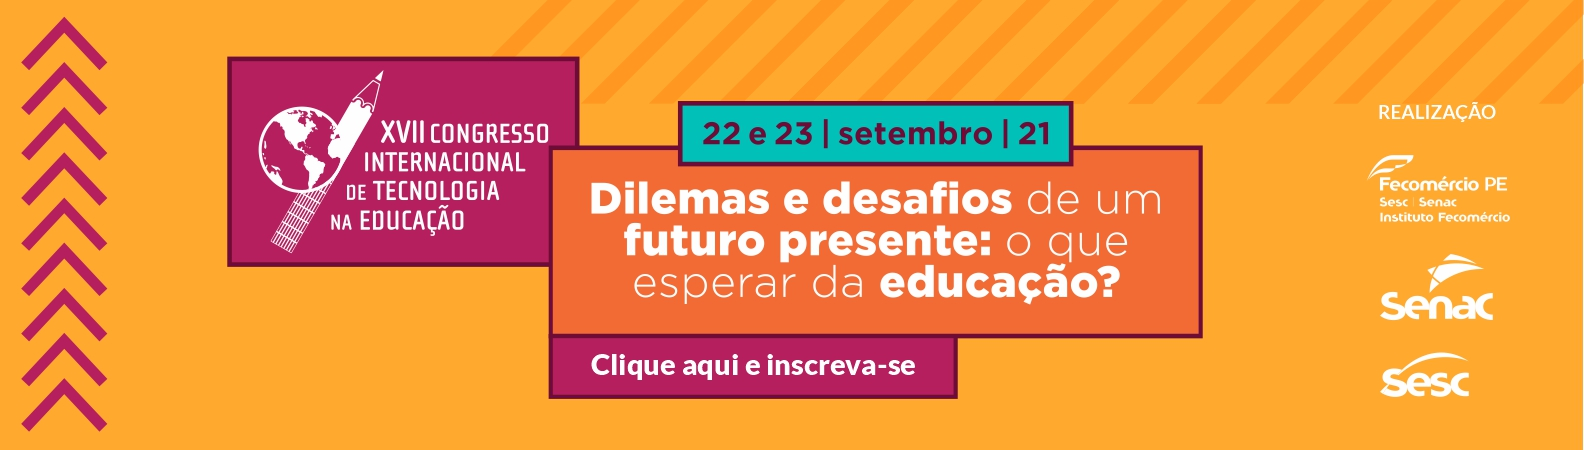 banner_congresso_site_fecomercio